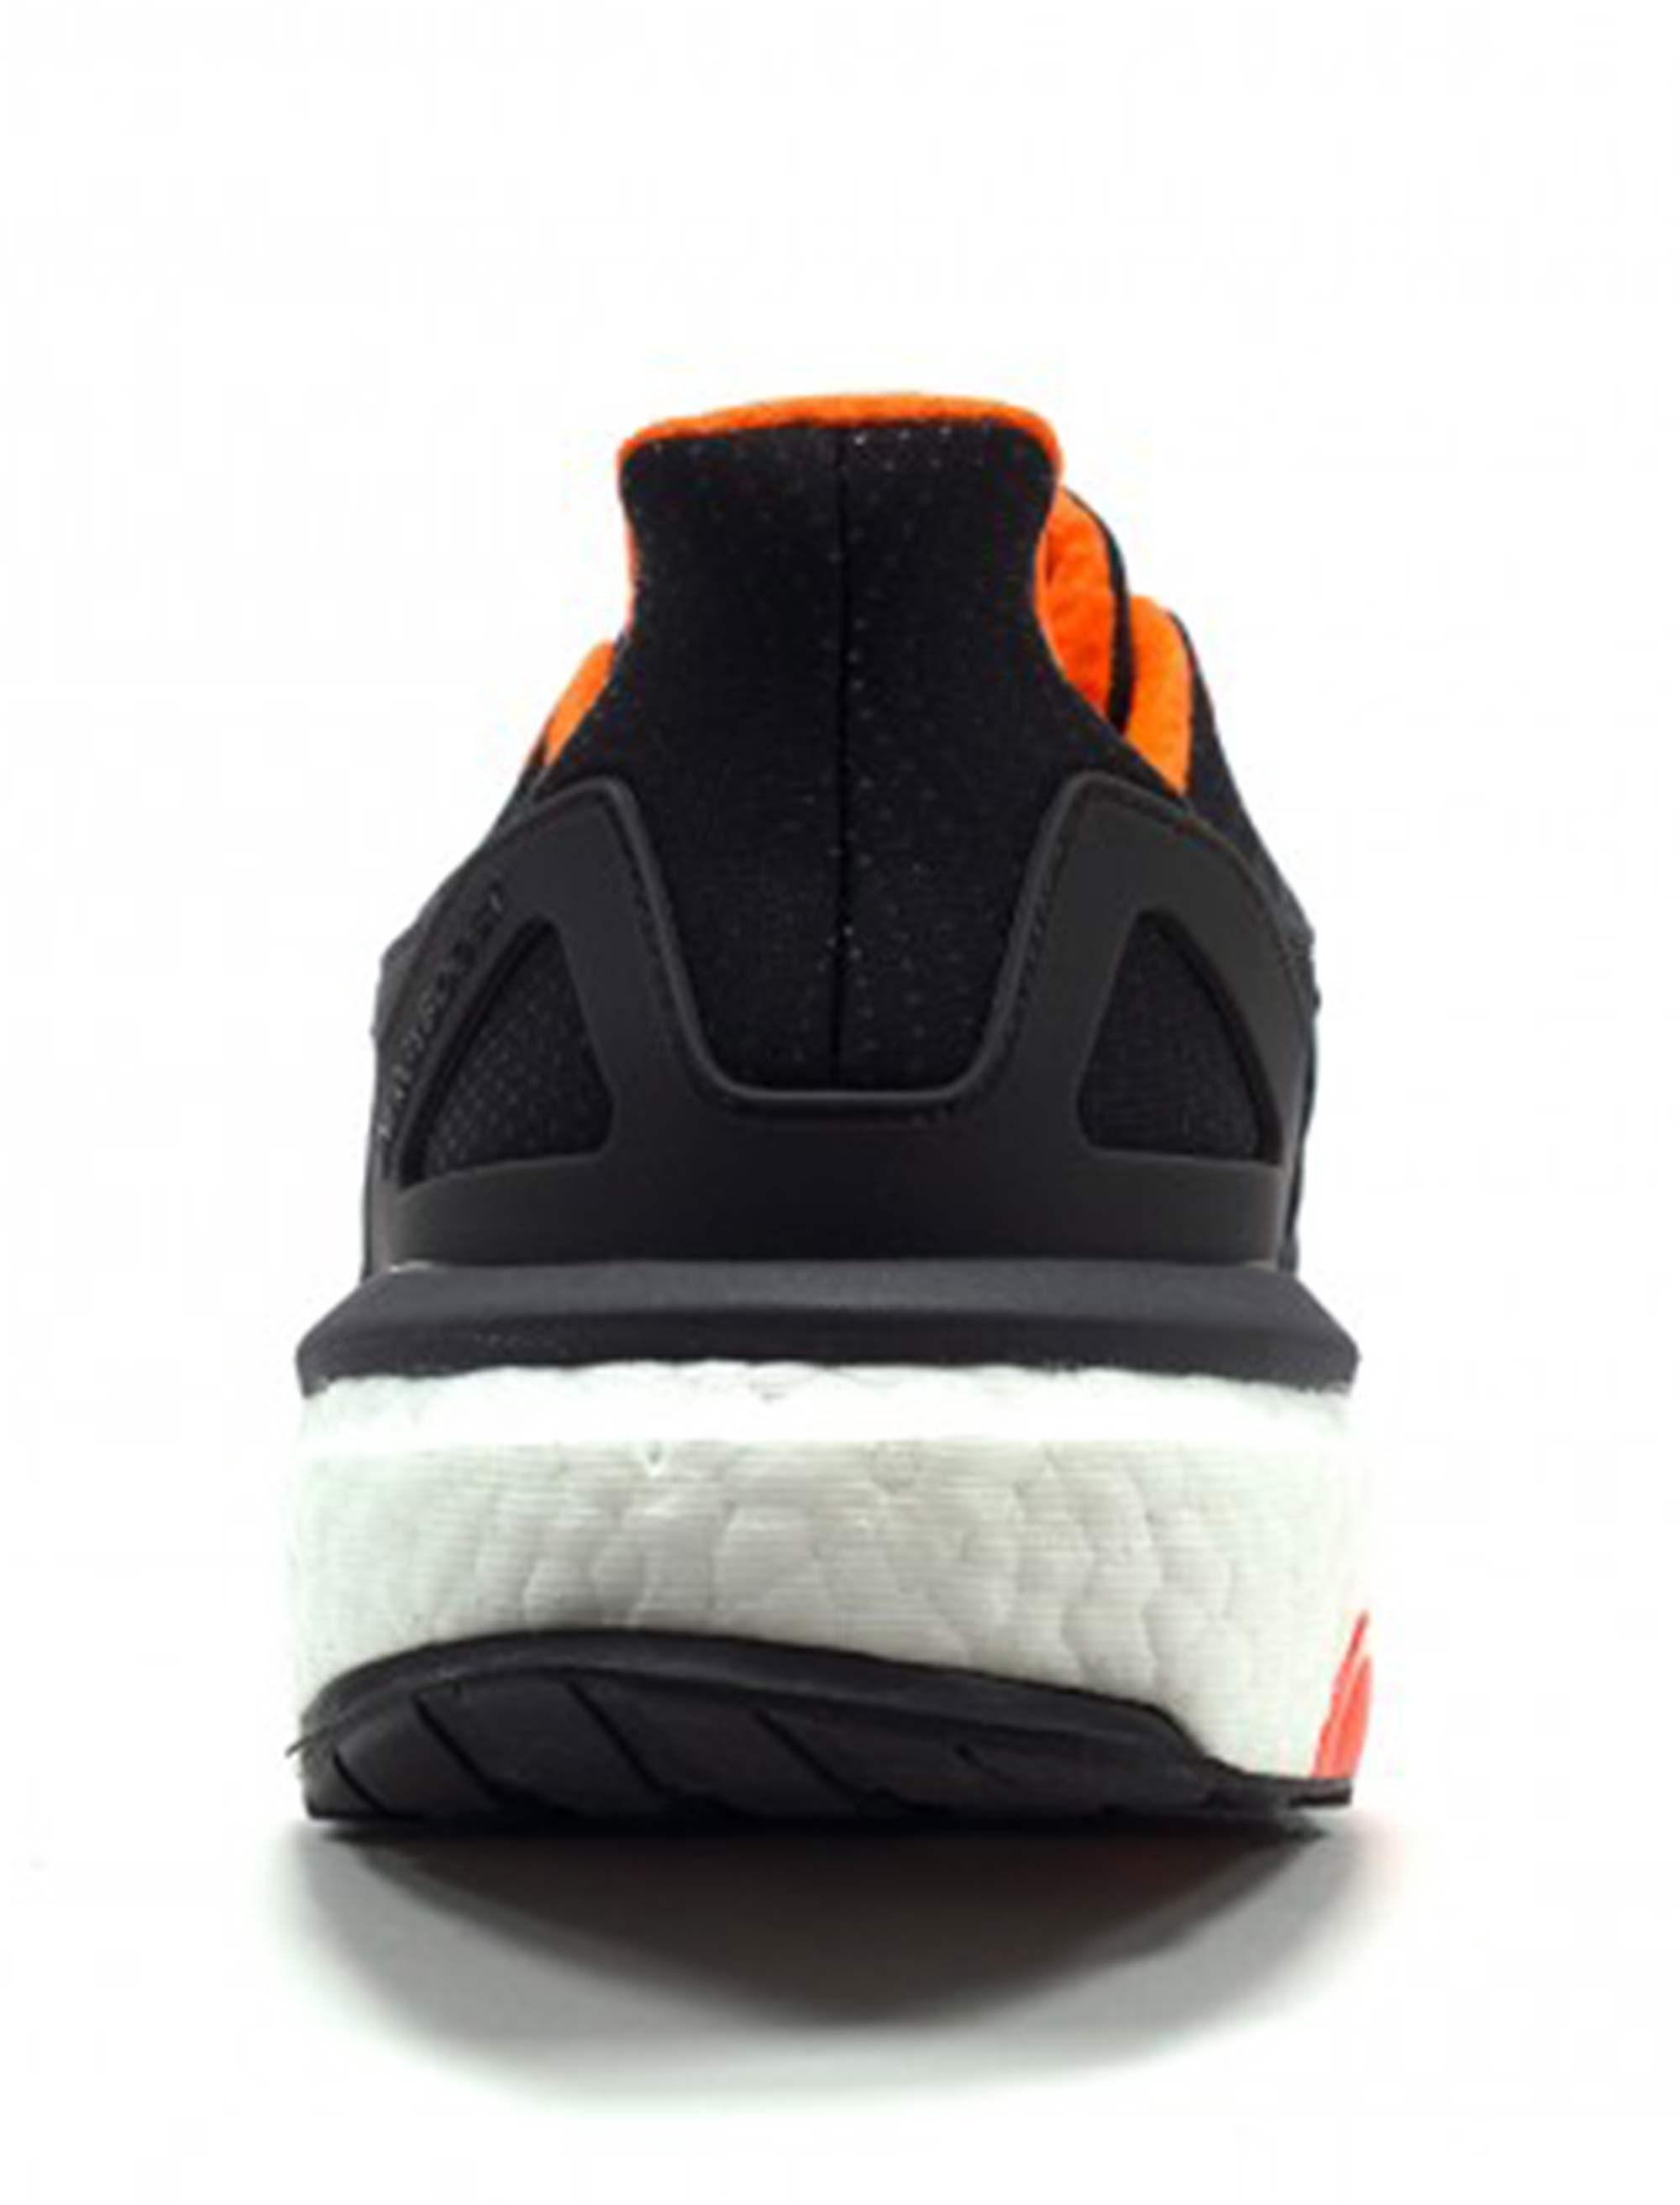 کفش دویدن مردانه آدیداس مدل Energy Boost - مشکي - 7